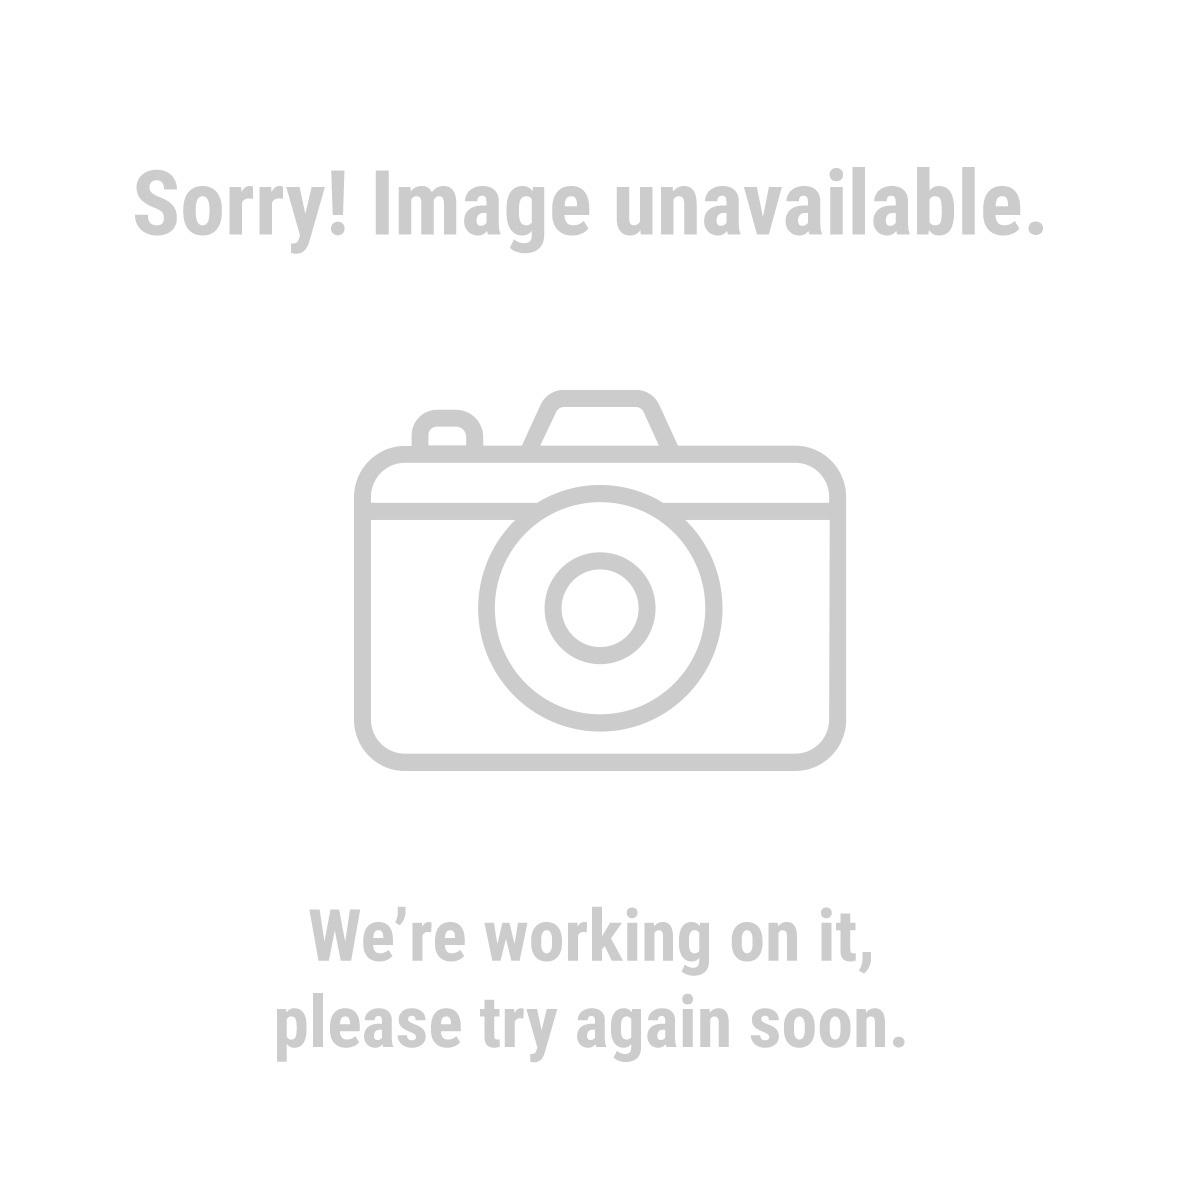 Haul-Master® 60800 Truck Bed Cargo Unloader